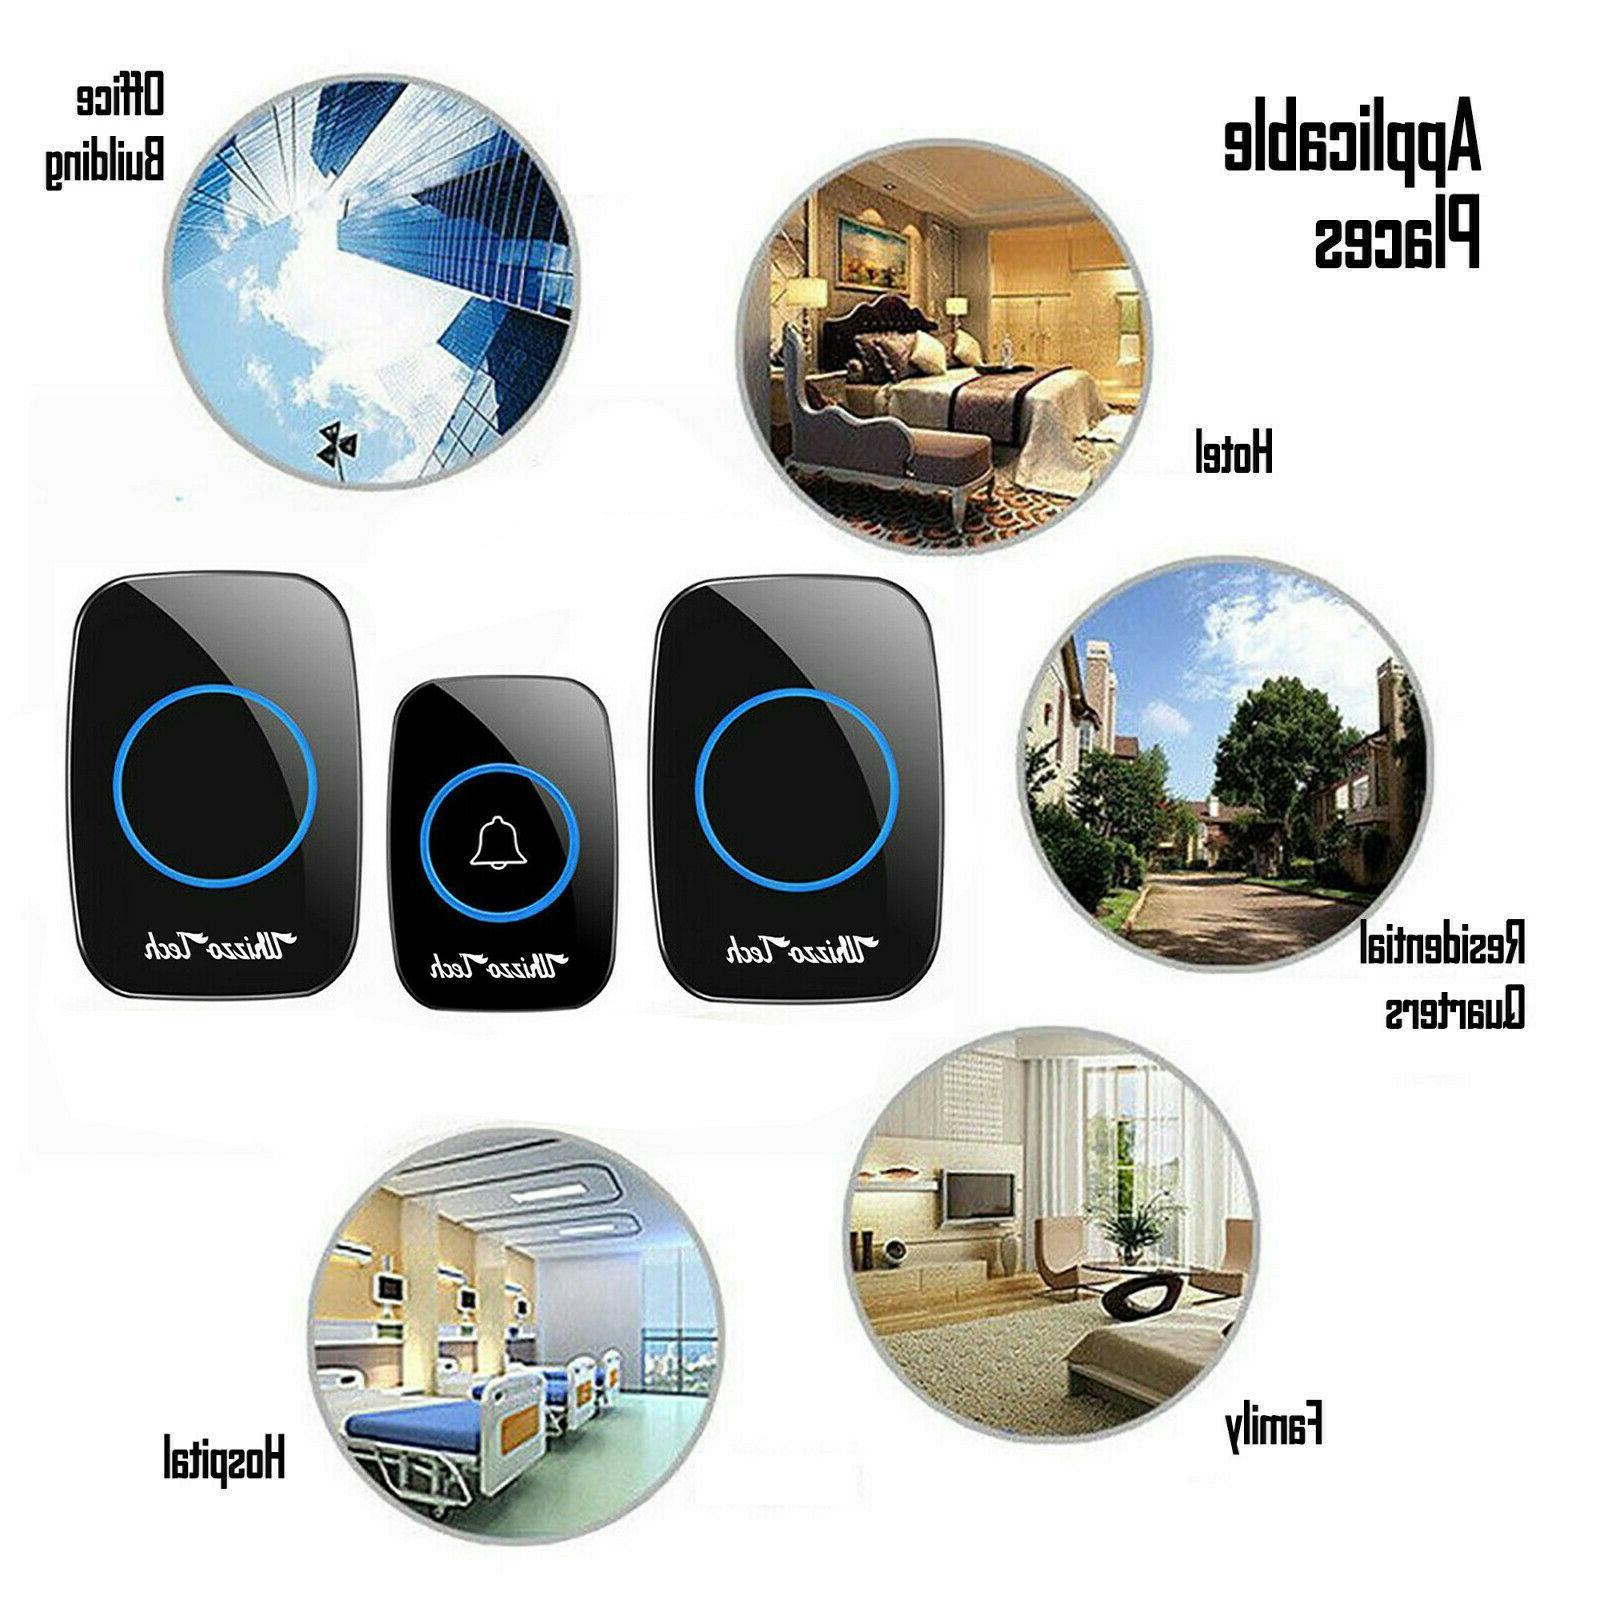 Wireless Doorbell Waterproof Plugin 1000FT 38 Chime